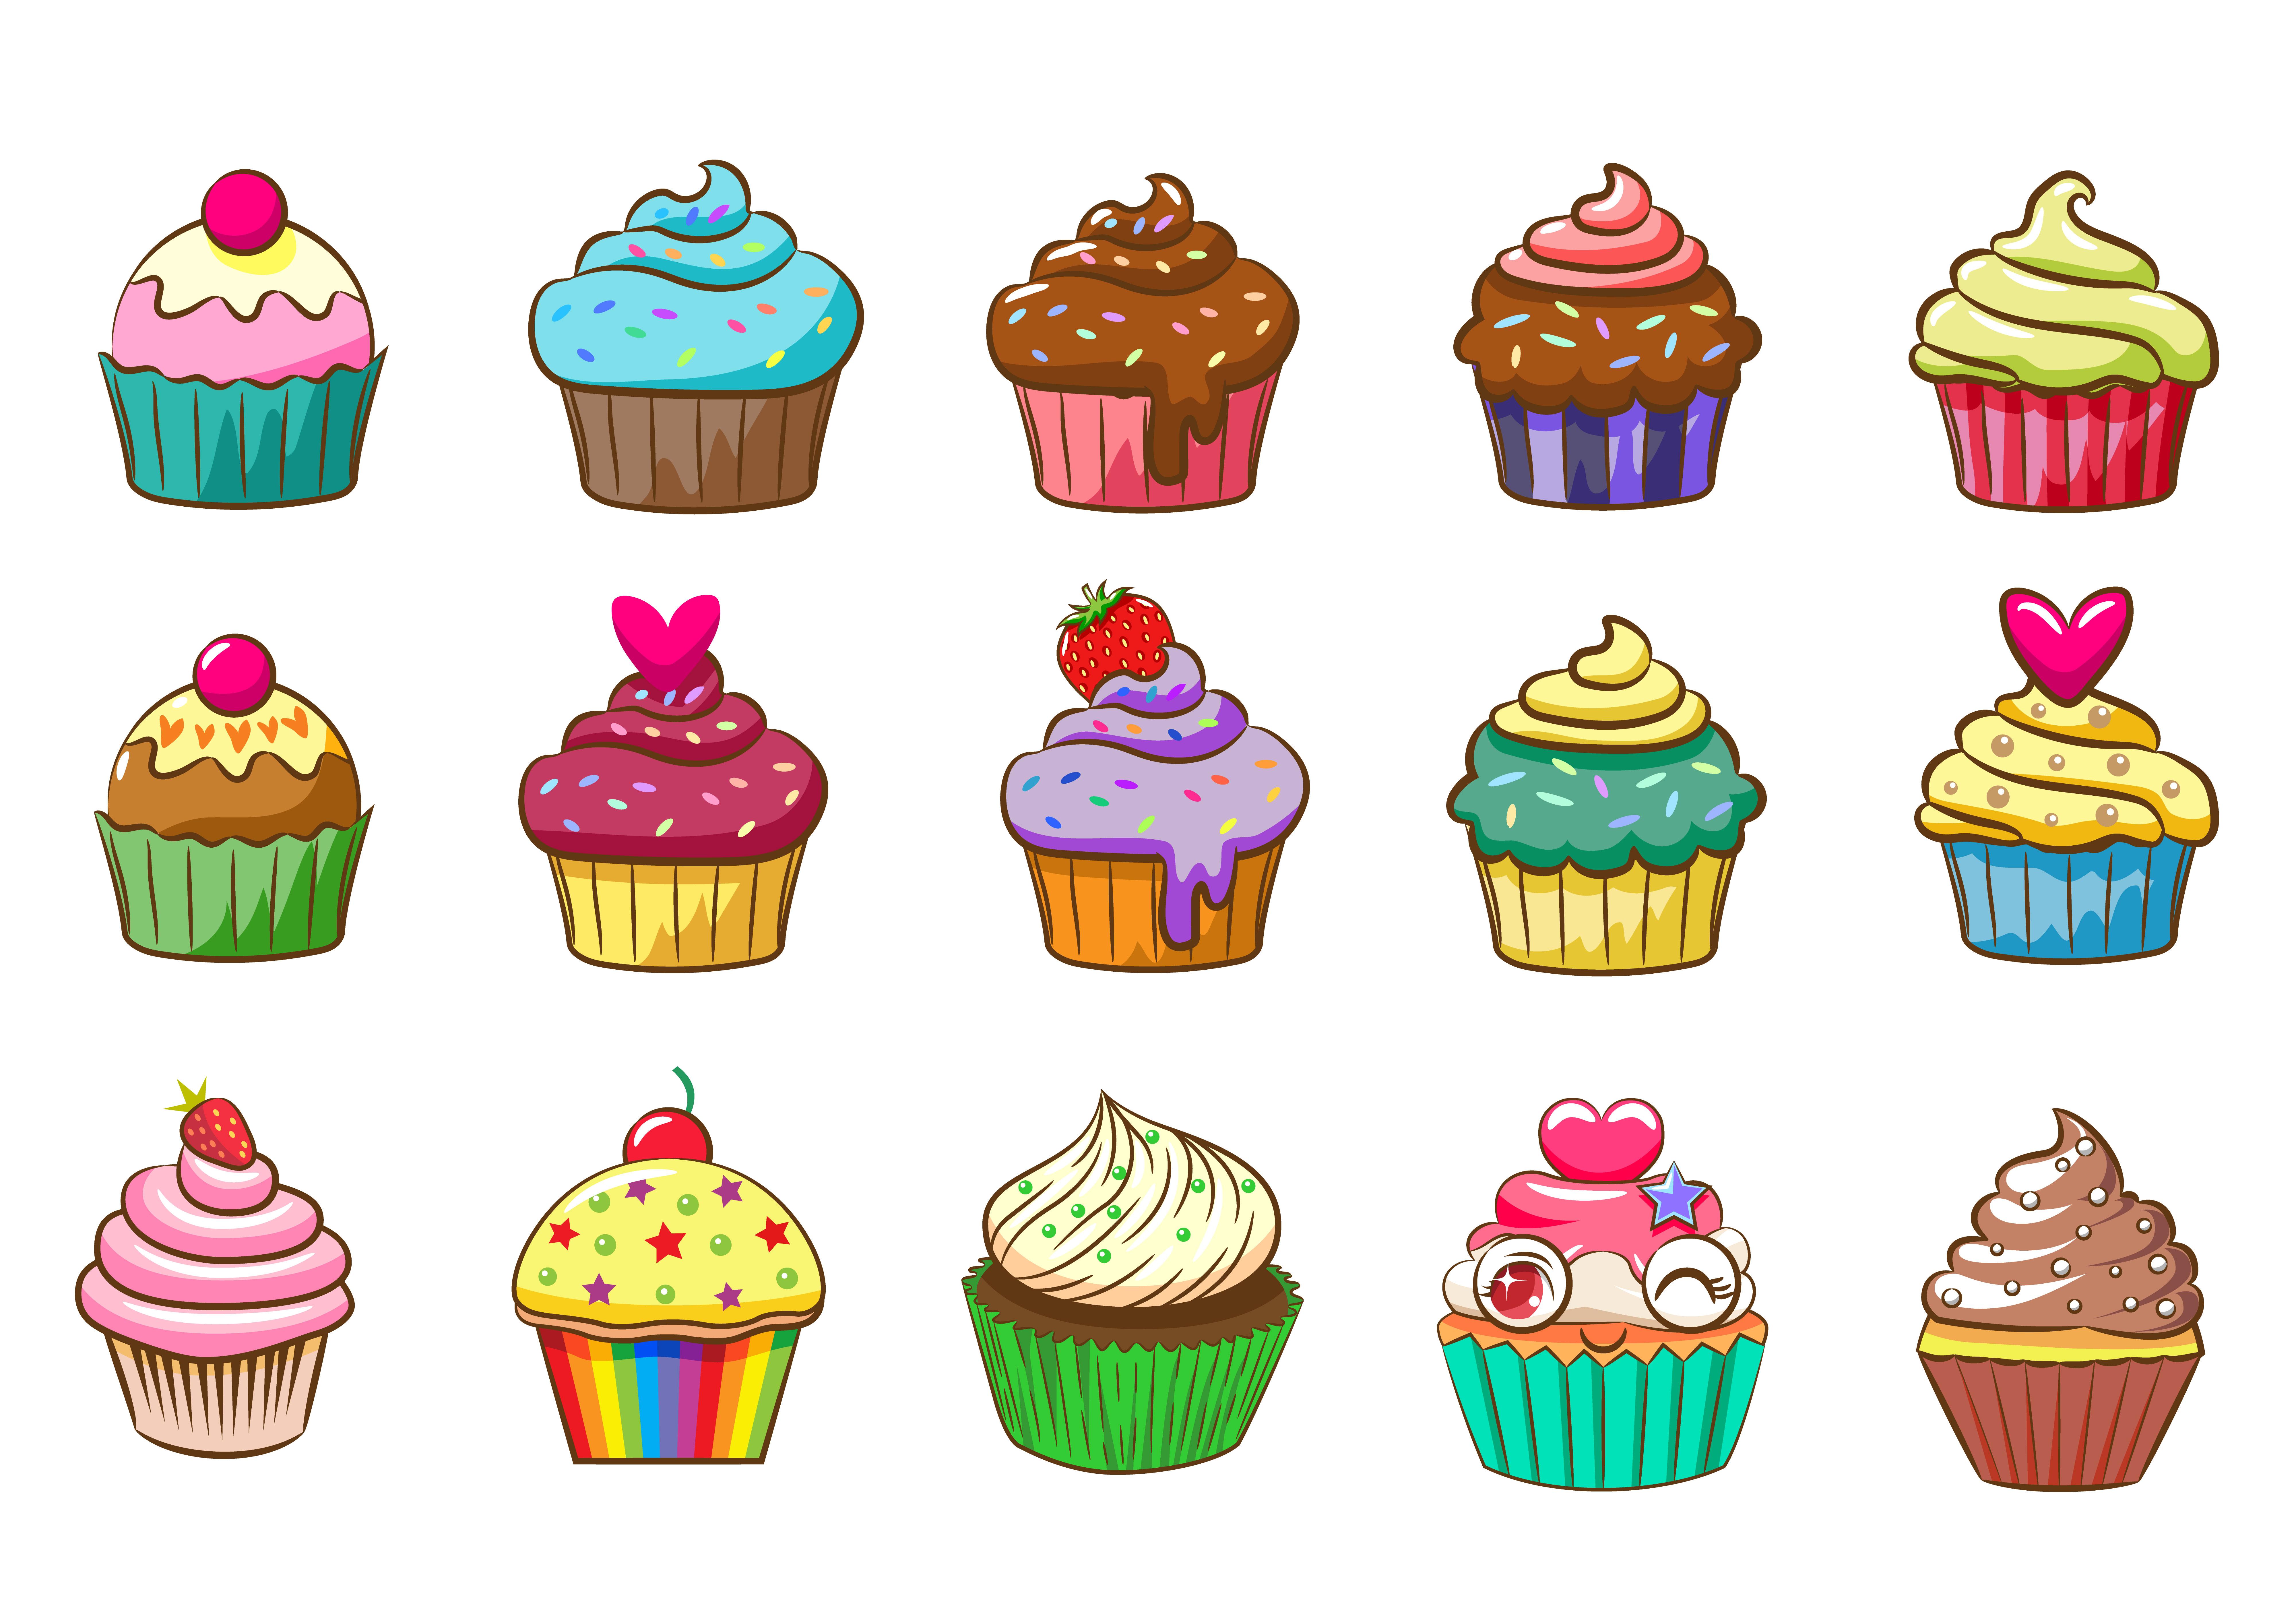 Colorful Cupcake Set - Download Free Vectors, Clipart ...